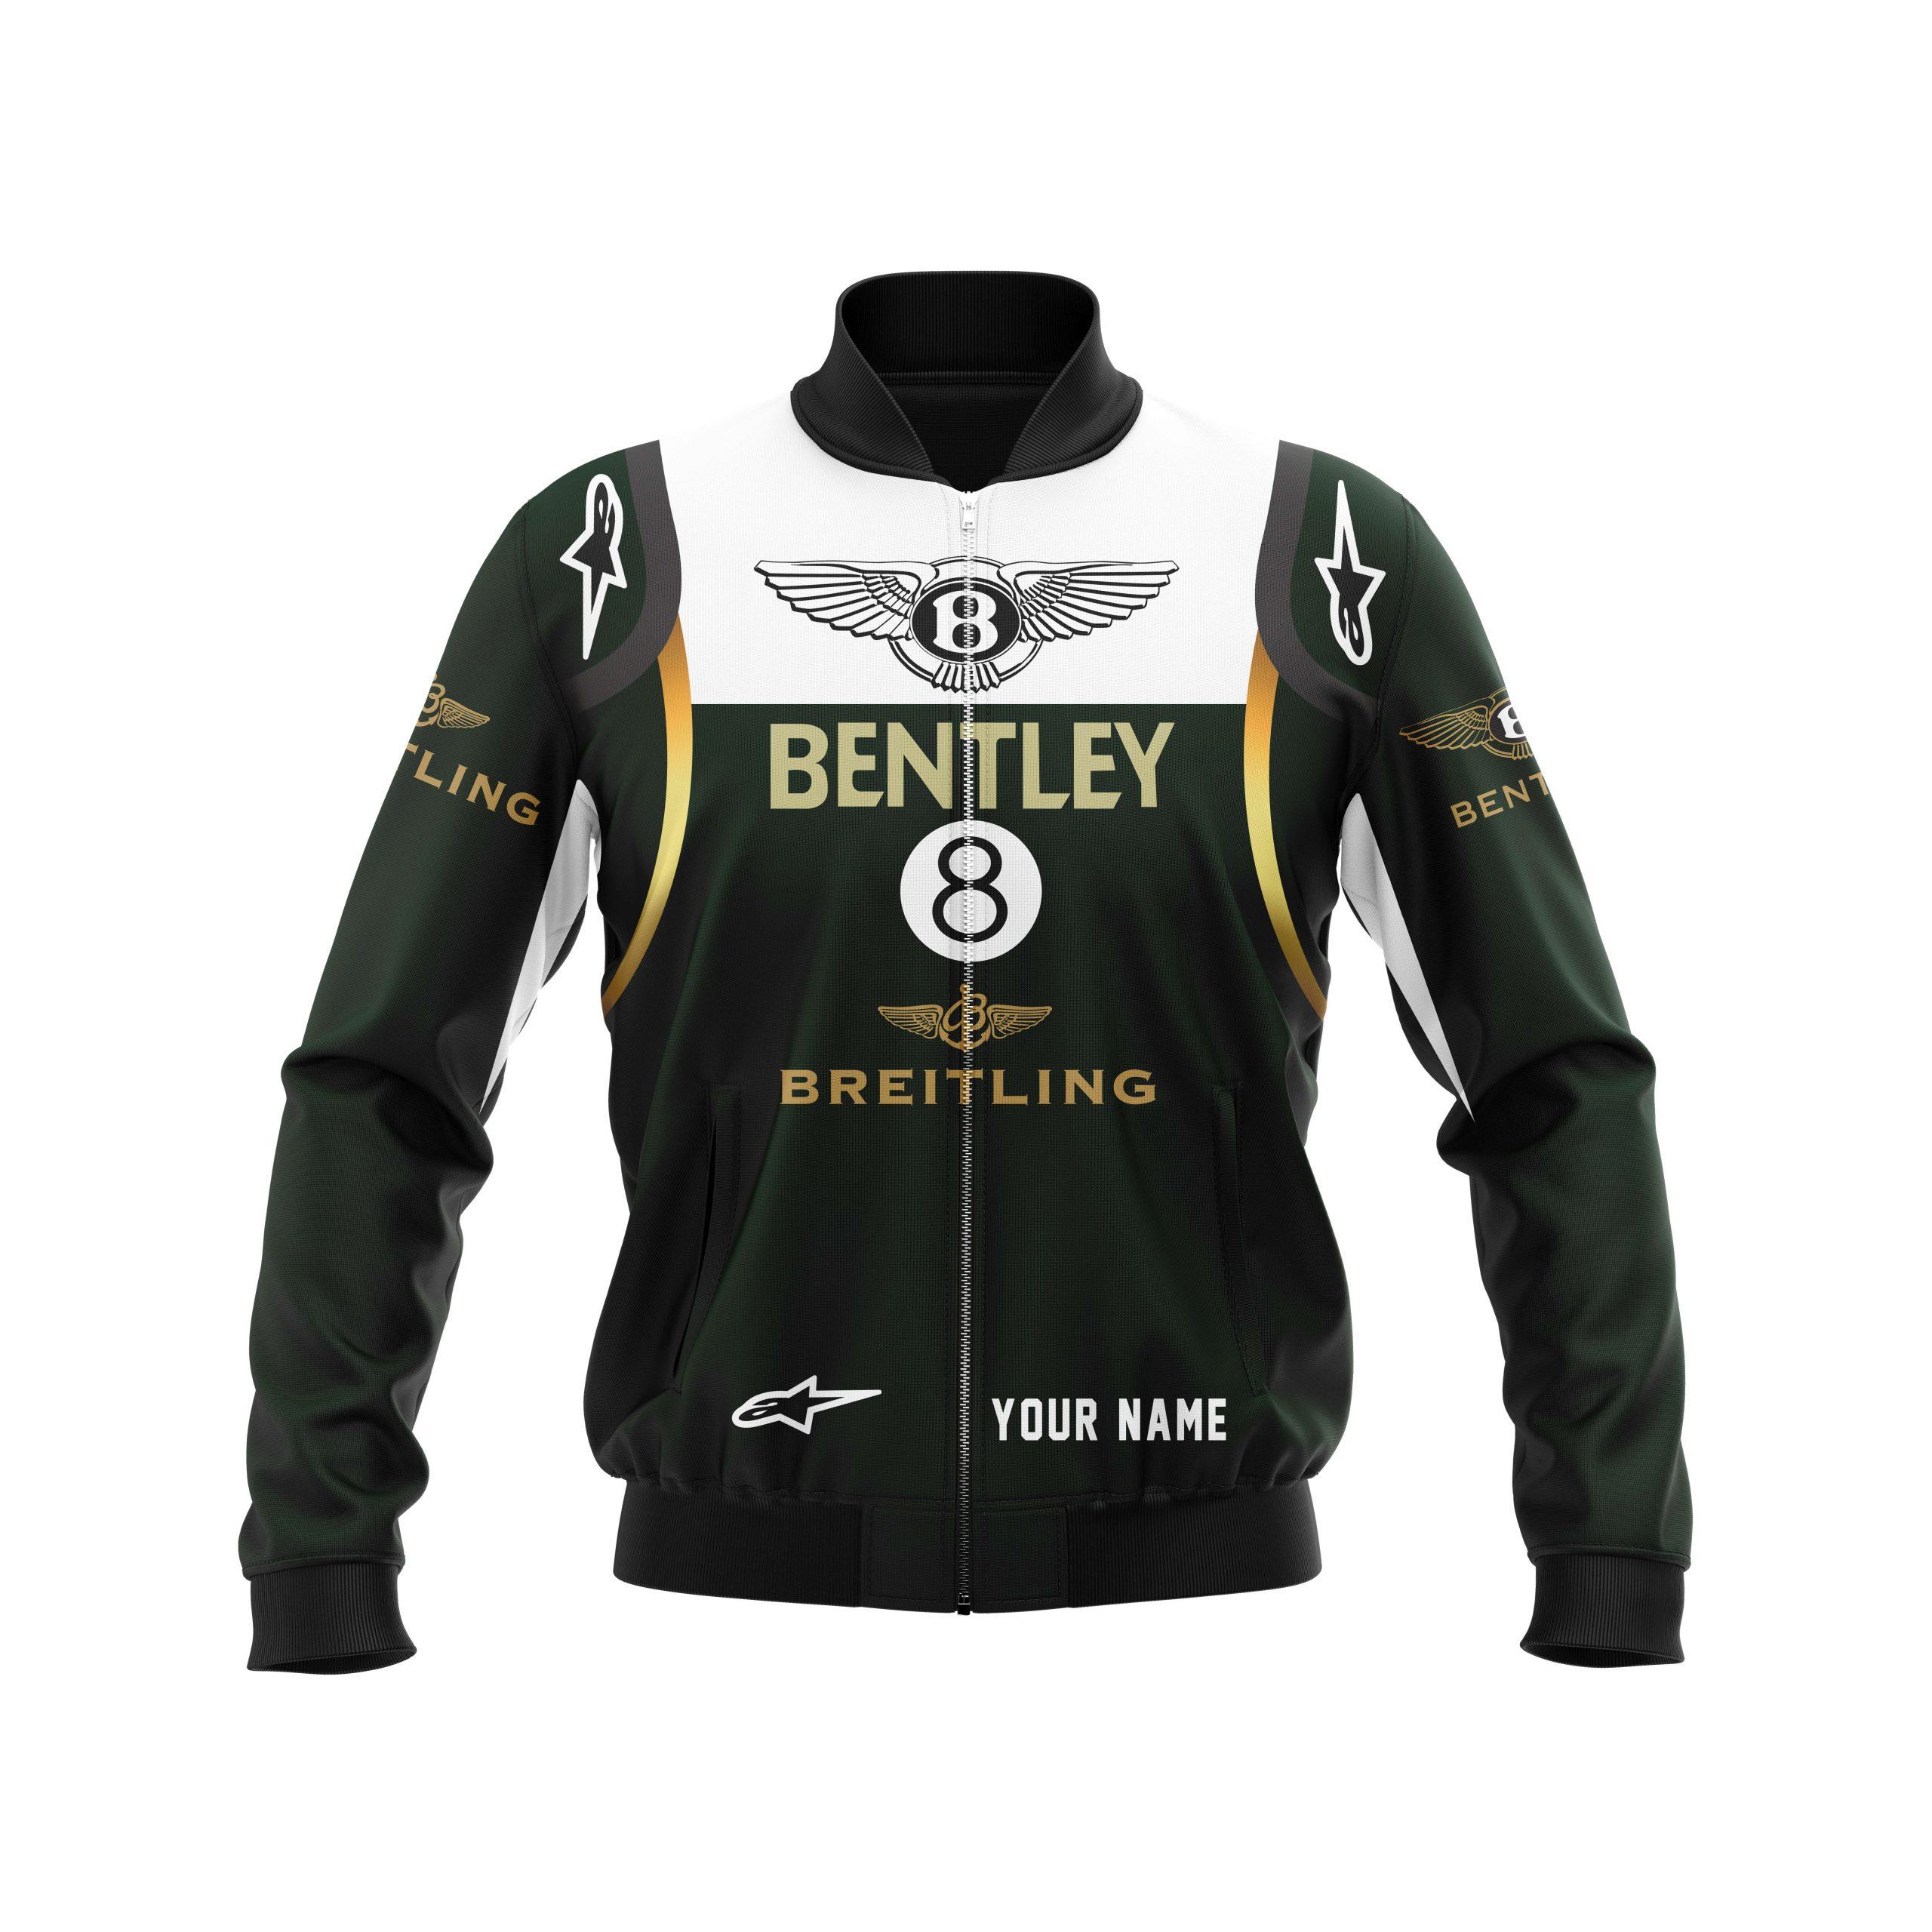 Personalized Bentley Breitling F1 racing Bomber Jacket